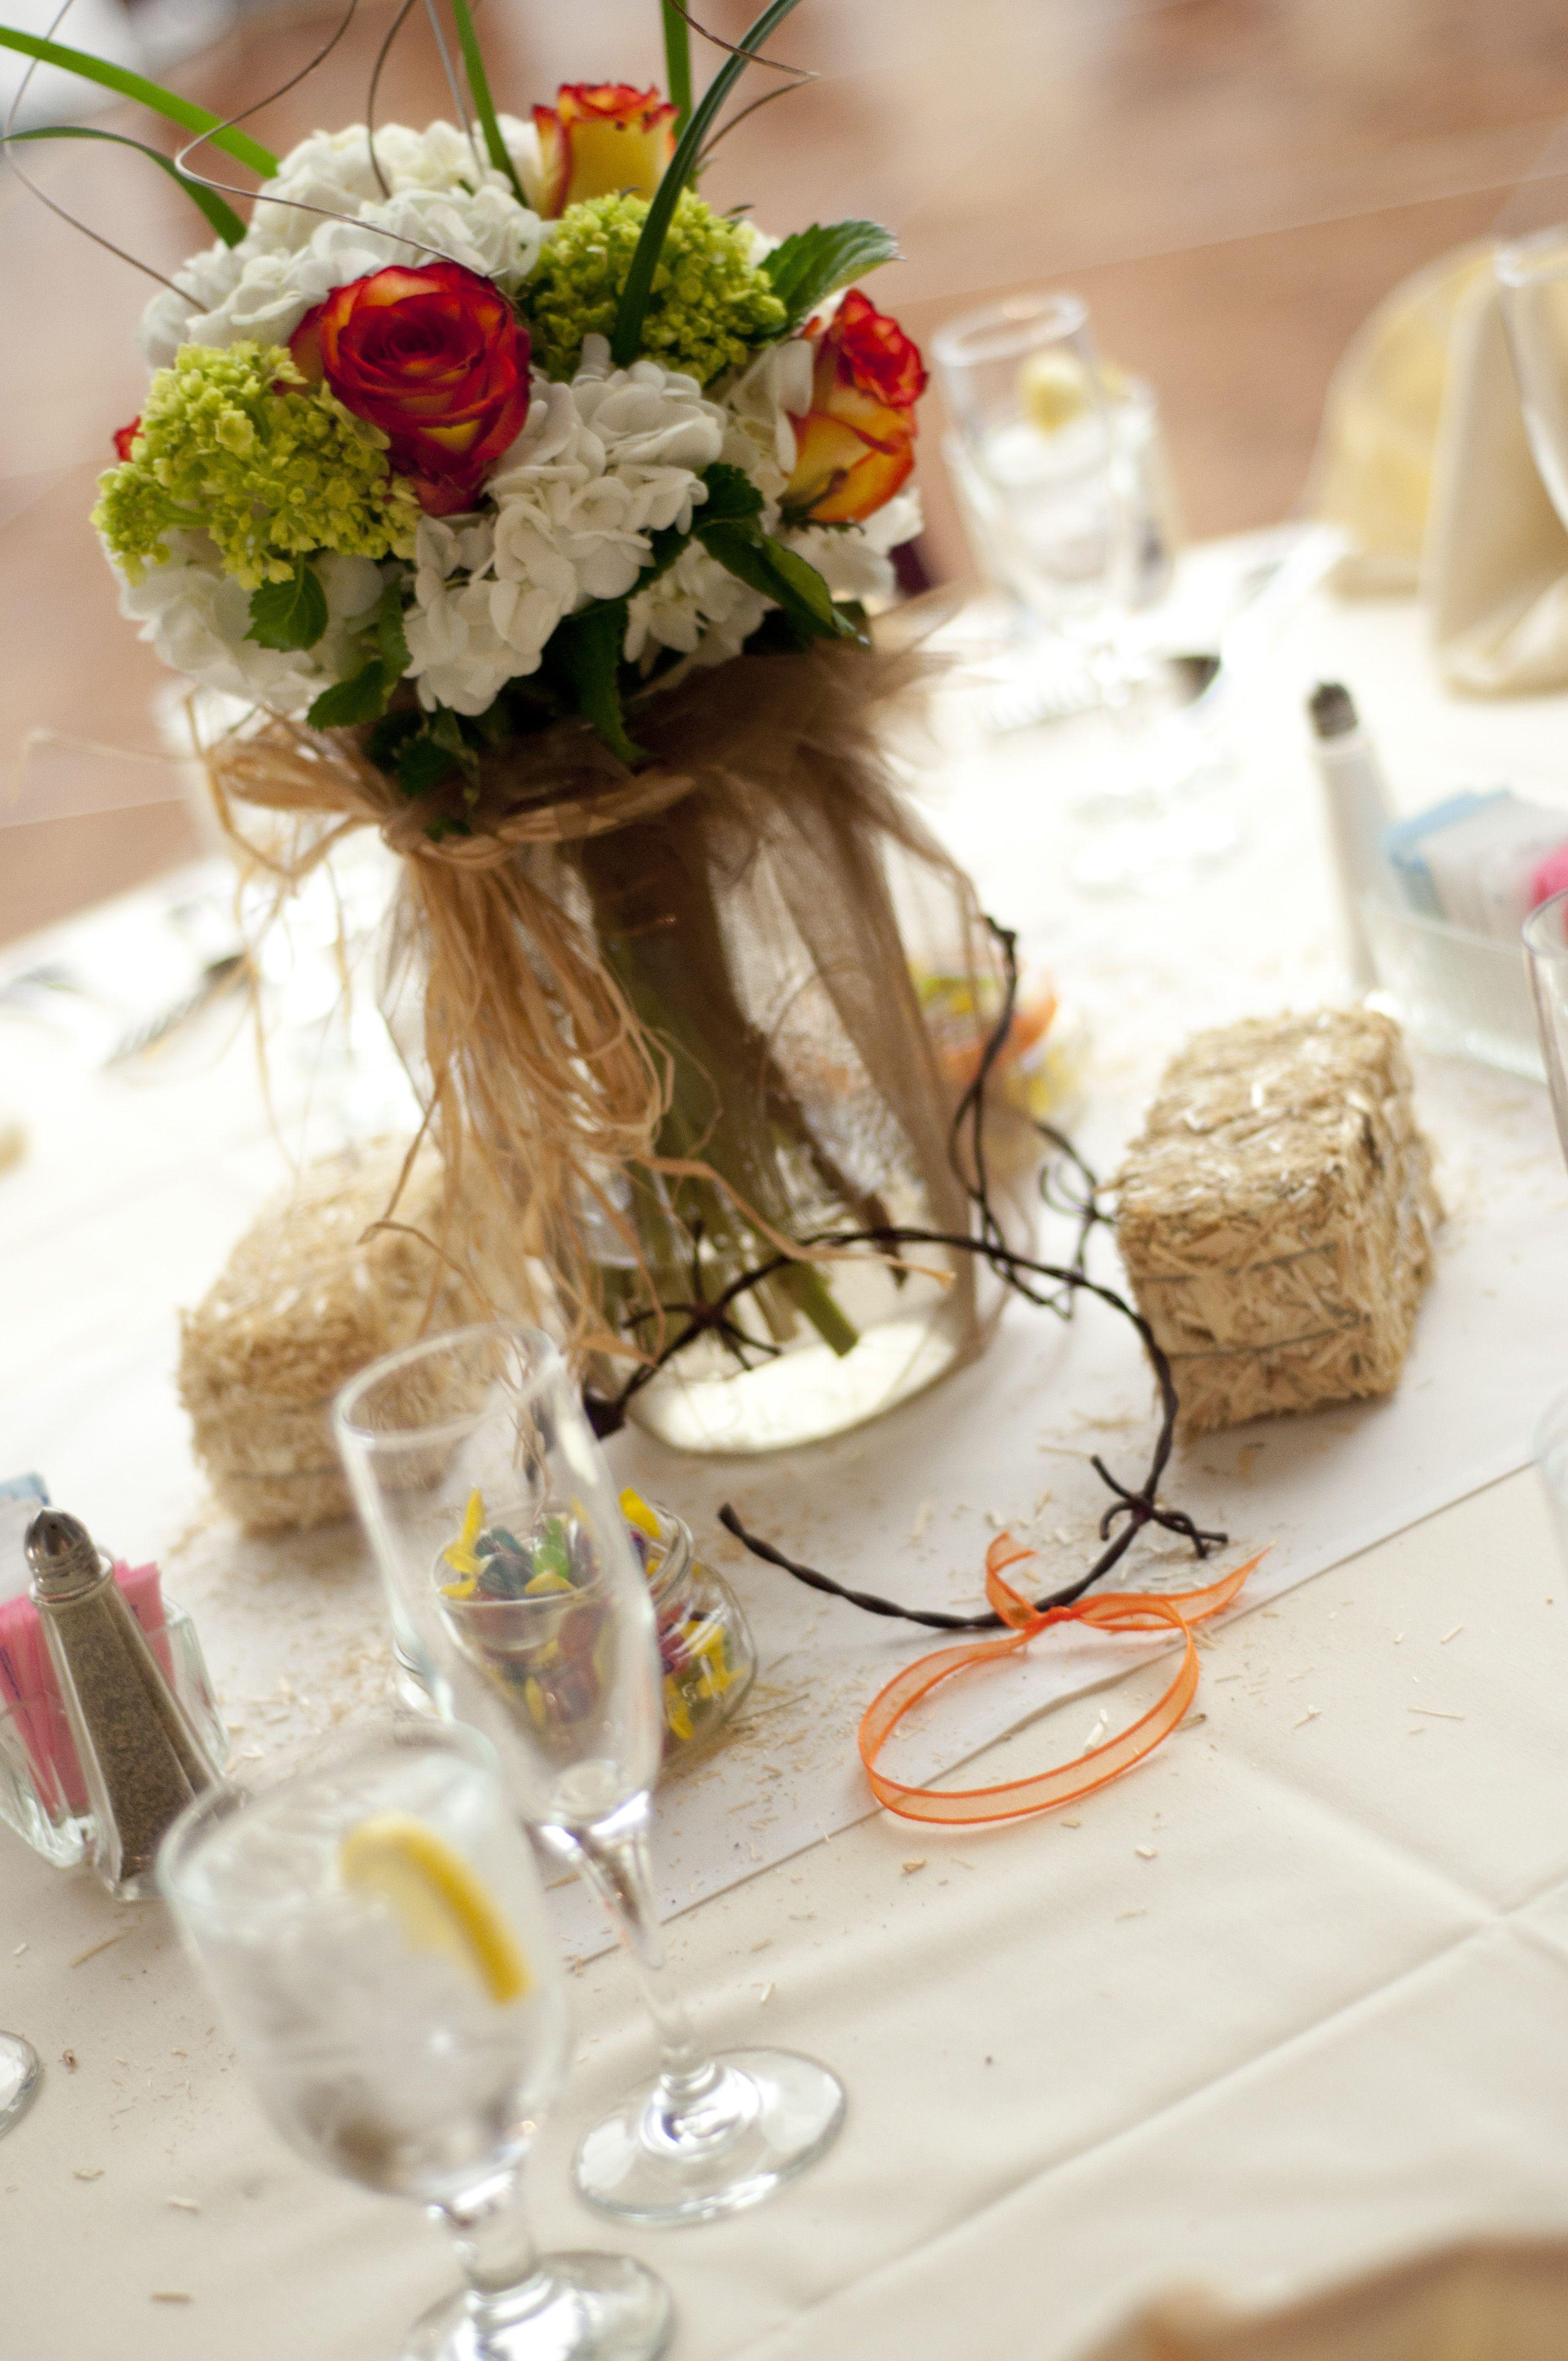 Western wedding table decorations